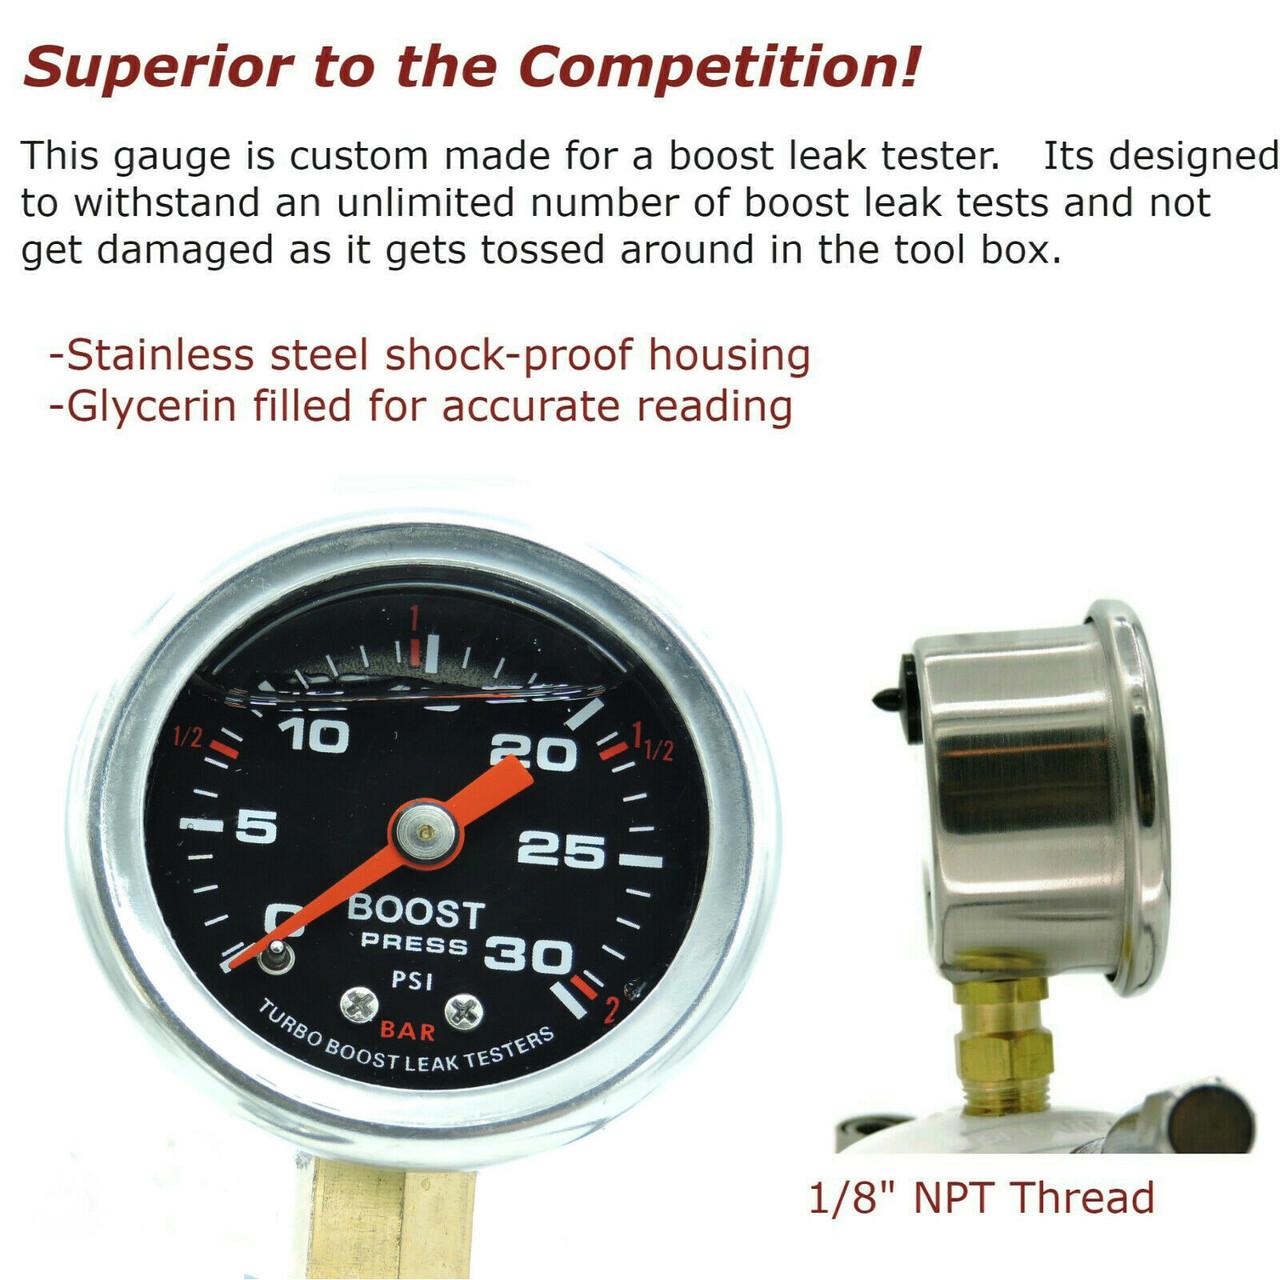 "Shop Kit - Small Frame Turbos 2"", 2.25"", 2.5"", 2.75"", 3"" - BILLET 6061 Aluminum - Universal Shop Boost Leak Tester Kit"